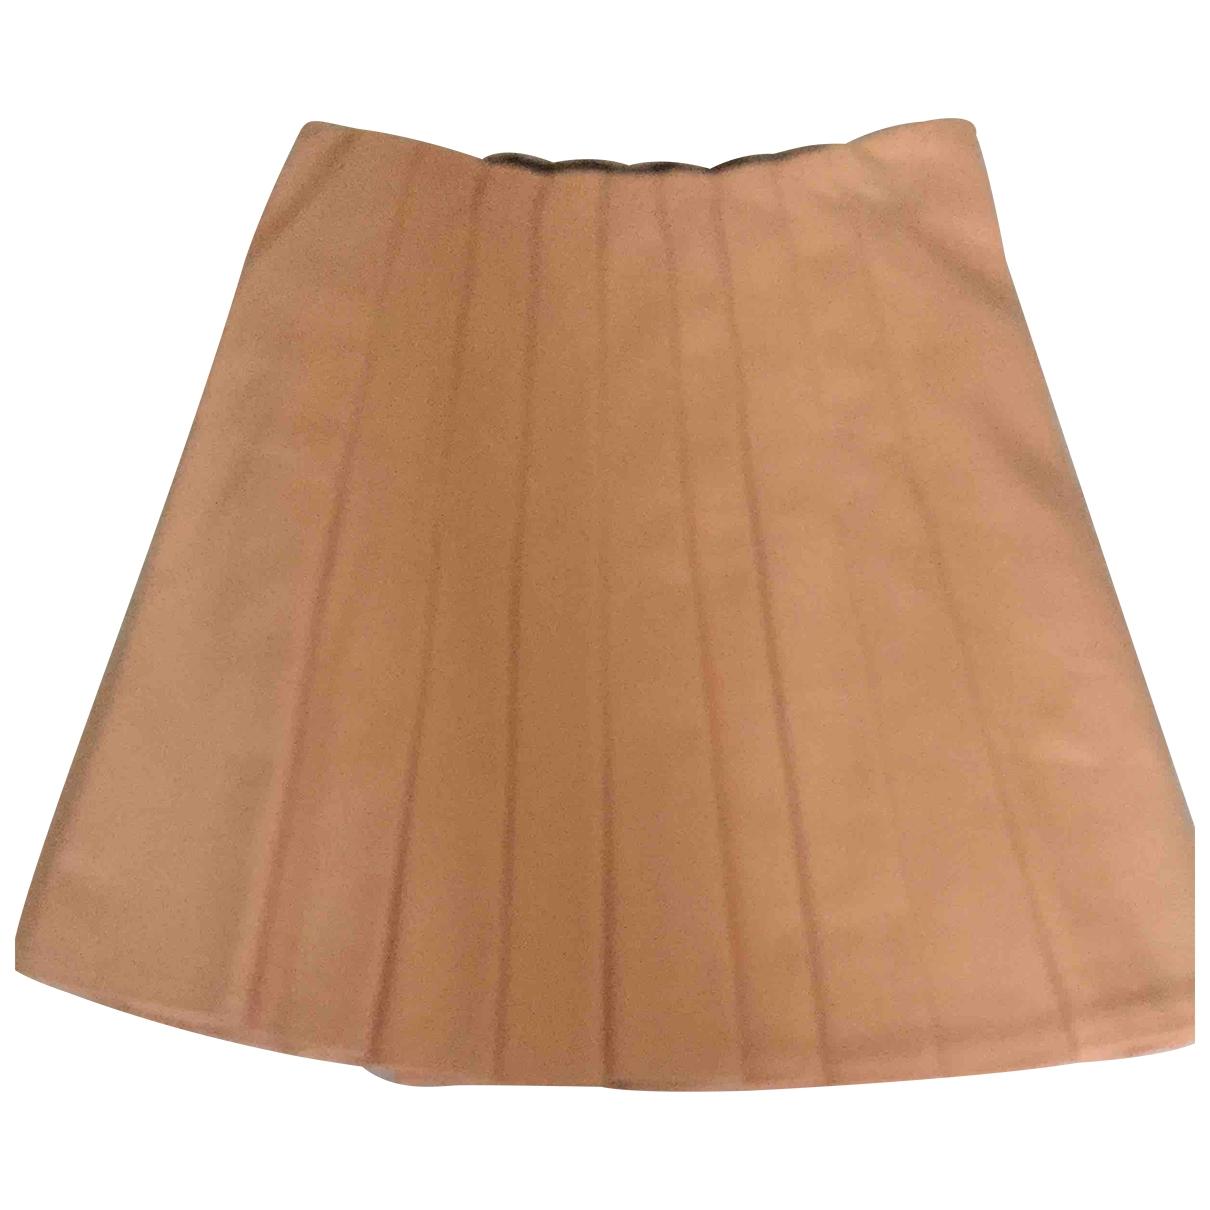 Zara - Jupe   pour femme en coton